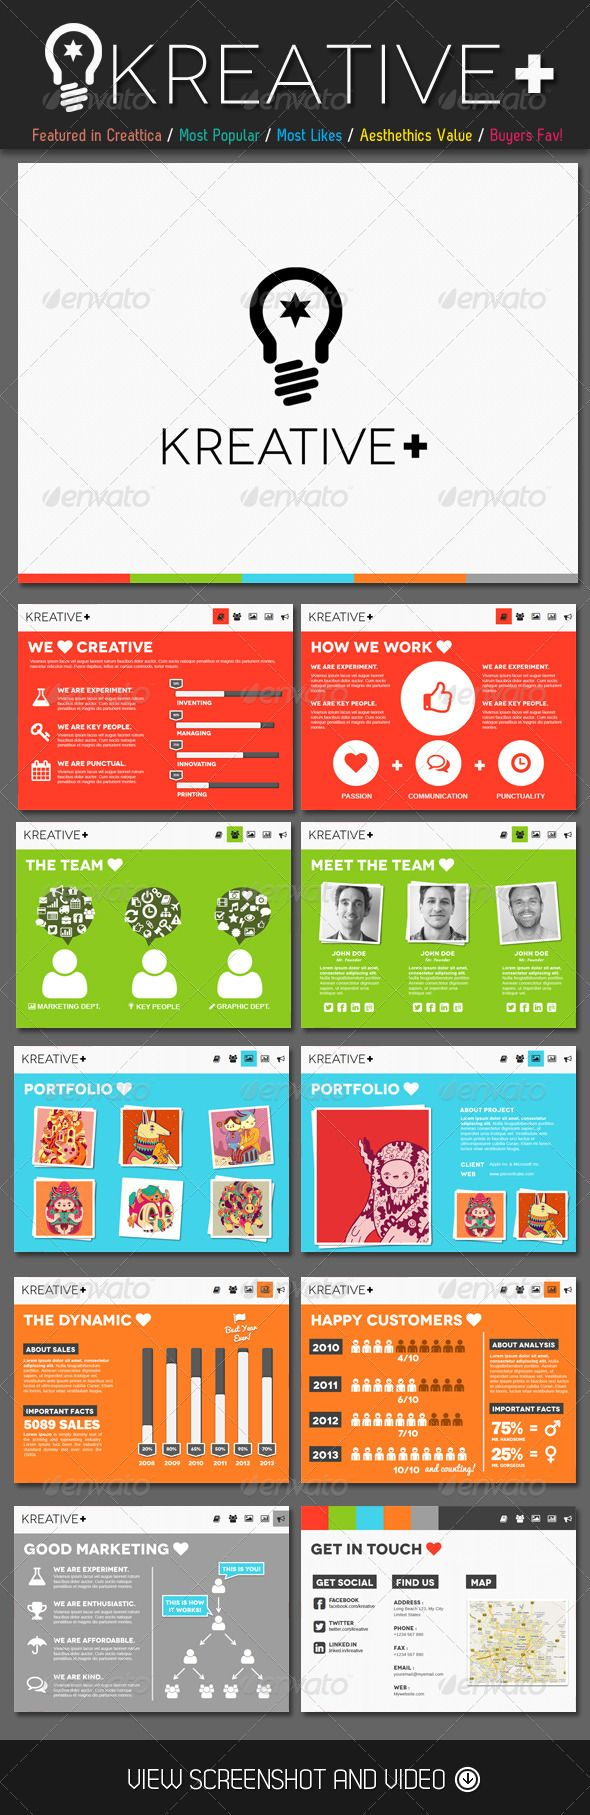 99 best powerpoint design images on pinterest | presentation, Powerpoint templates